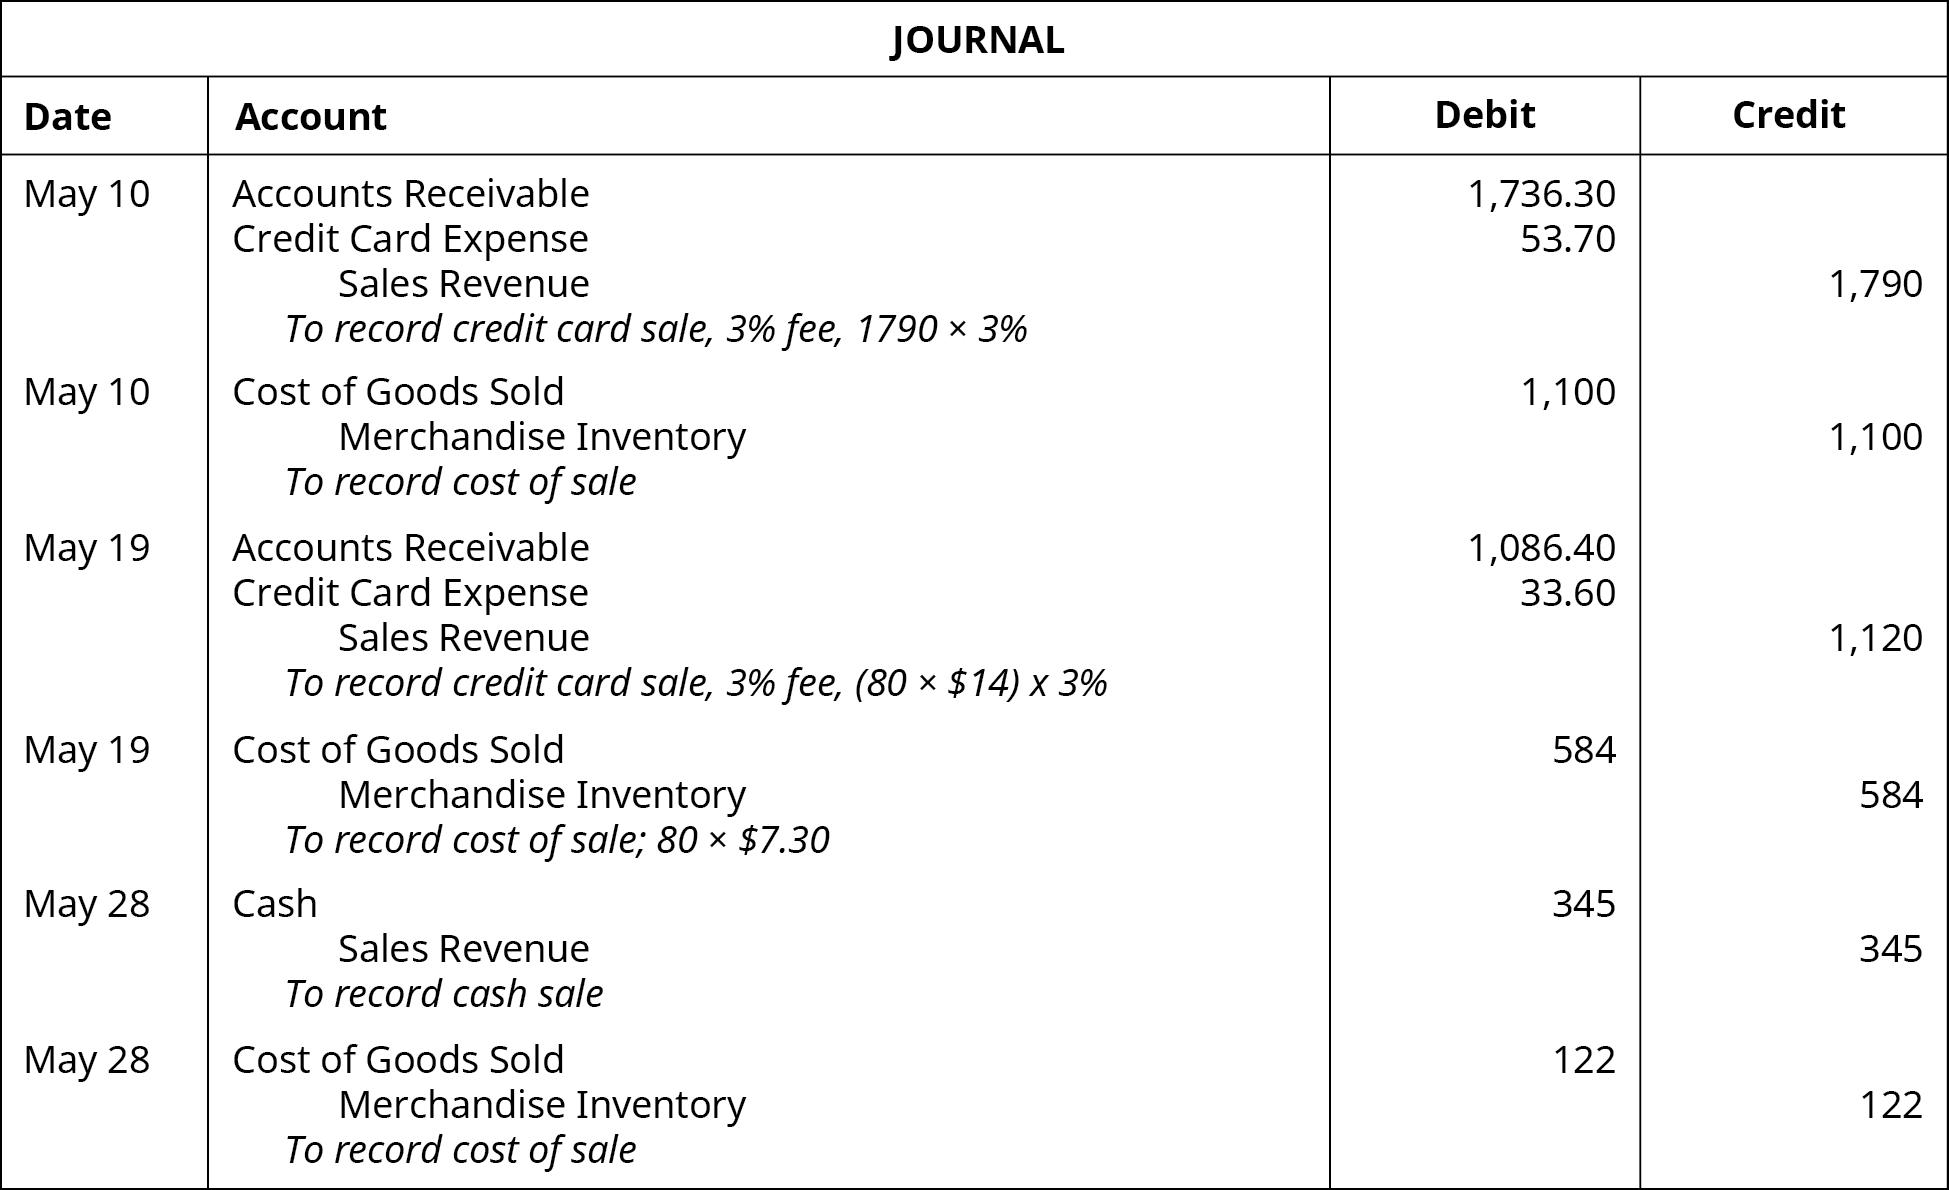 Journal entries: May 10: debit Accounts Receivable 1,736.30, debit Credit Card Expense 53.70, credit Sales Revenue 1790. Explanation: To record credit card sale, 3 percent fee. 1790 times 3 percent. May 10: debit COGS 1,100, credit Merchandise Inventory 1,100. Explanation: to record cost of sale. May 19: debit Accounts Receivable 1086.40, debit Credit Card Expense 33.60, credit Sales Revenue 1,120. Explanation: To record credit card sale, 3 percent fee, (80 times $14) times 3 percent. May 19: debit COGS 584, credit Merchandise Inventory 584. Explanation: to record cost of sale; 80 times $7.30. May 28: debit Cash 345, credit Sales Revenue 345. Explanation: To record cash sale. May 28: debit COGS 122, credit Merchandise Inventory 122. Explanation: To record cost of sale.